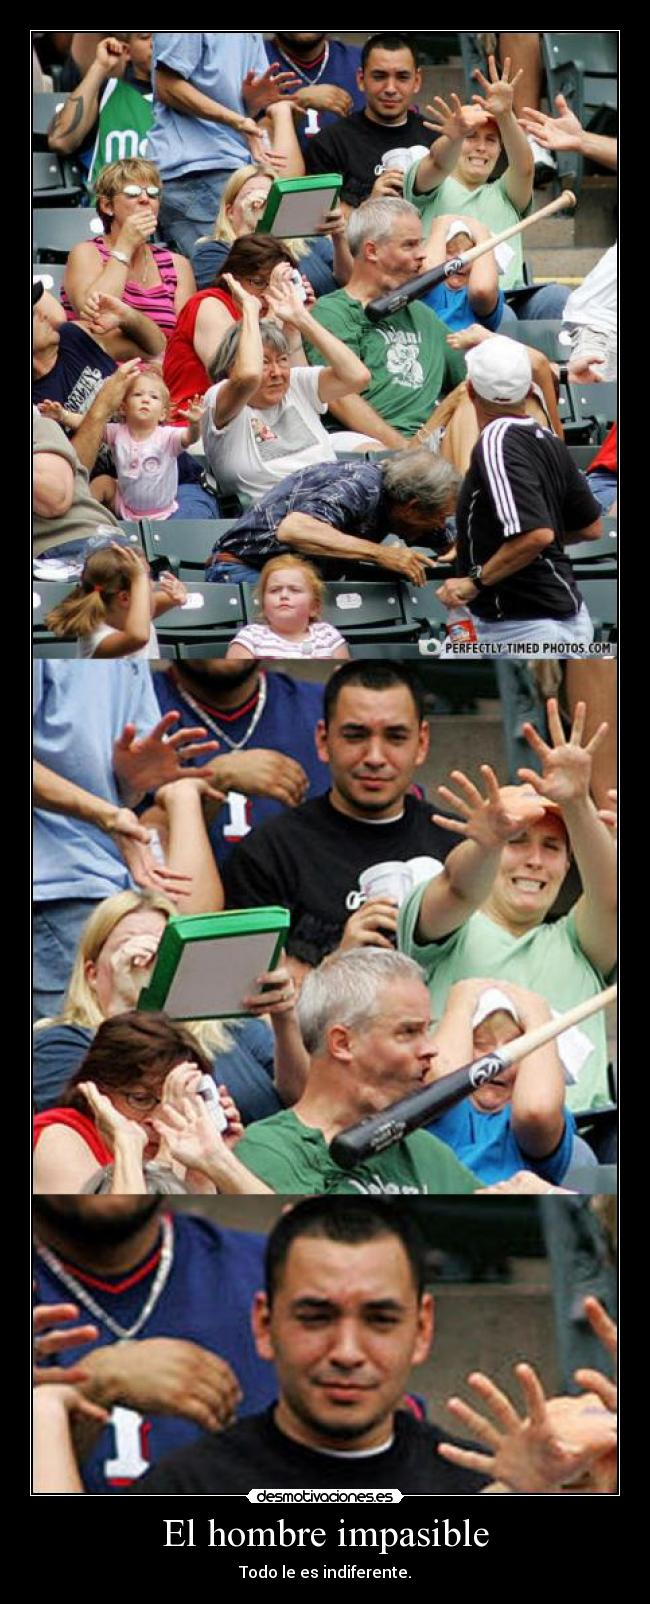 carteles hombre impasible indiferencia bate baseball desmotivaciones